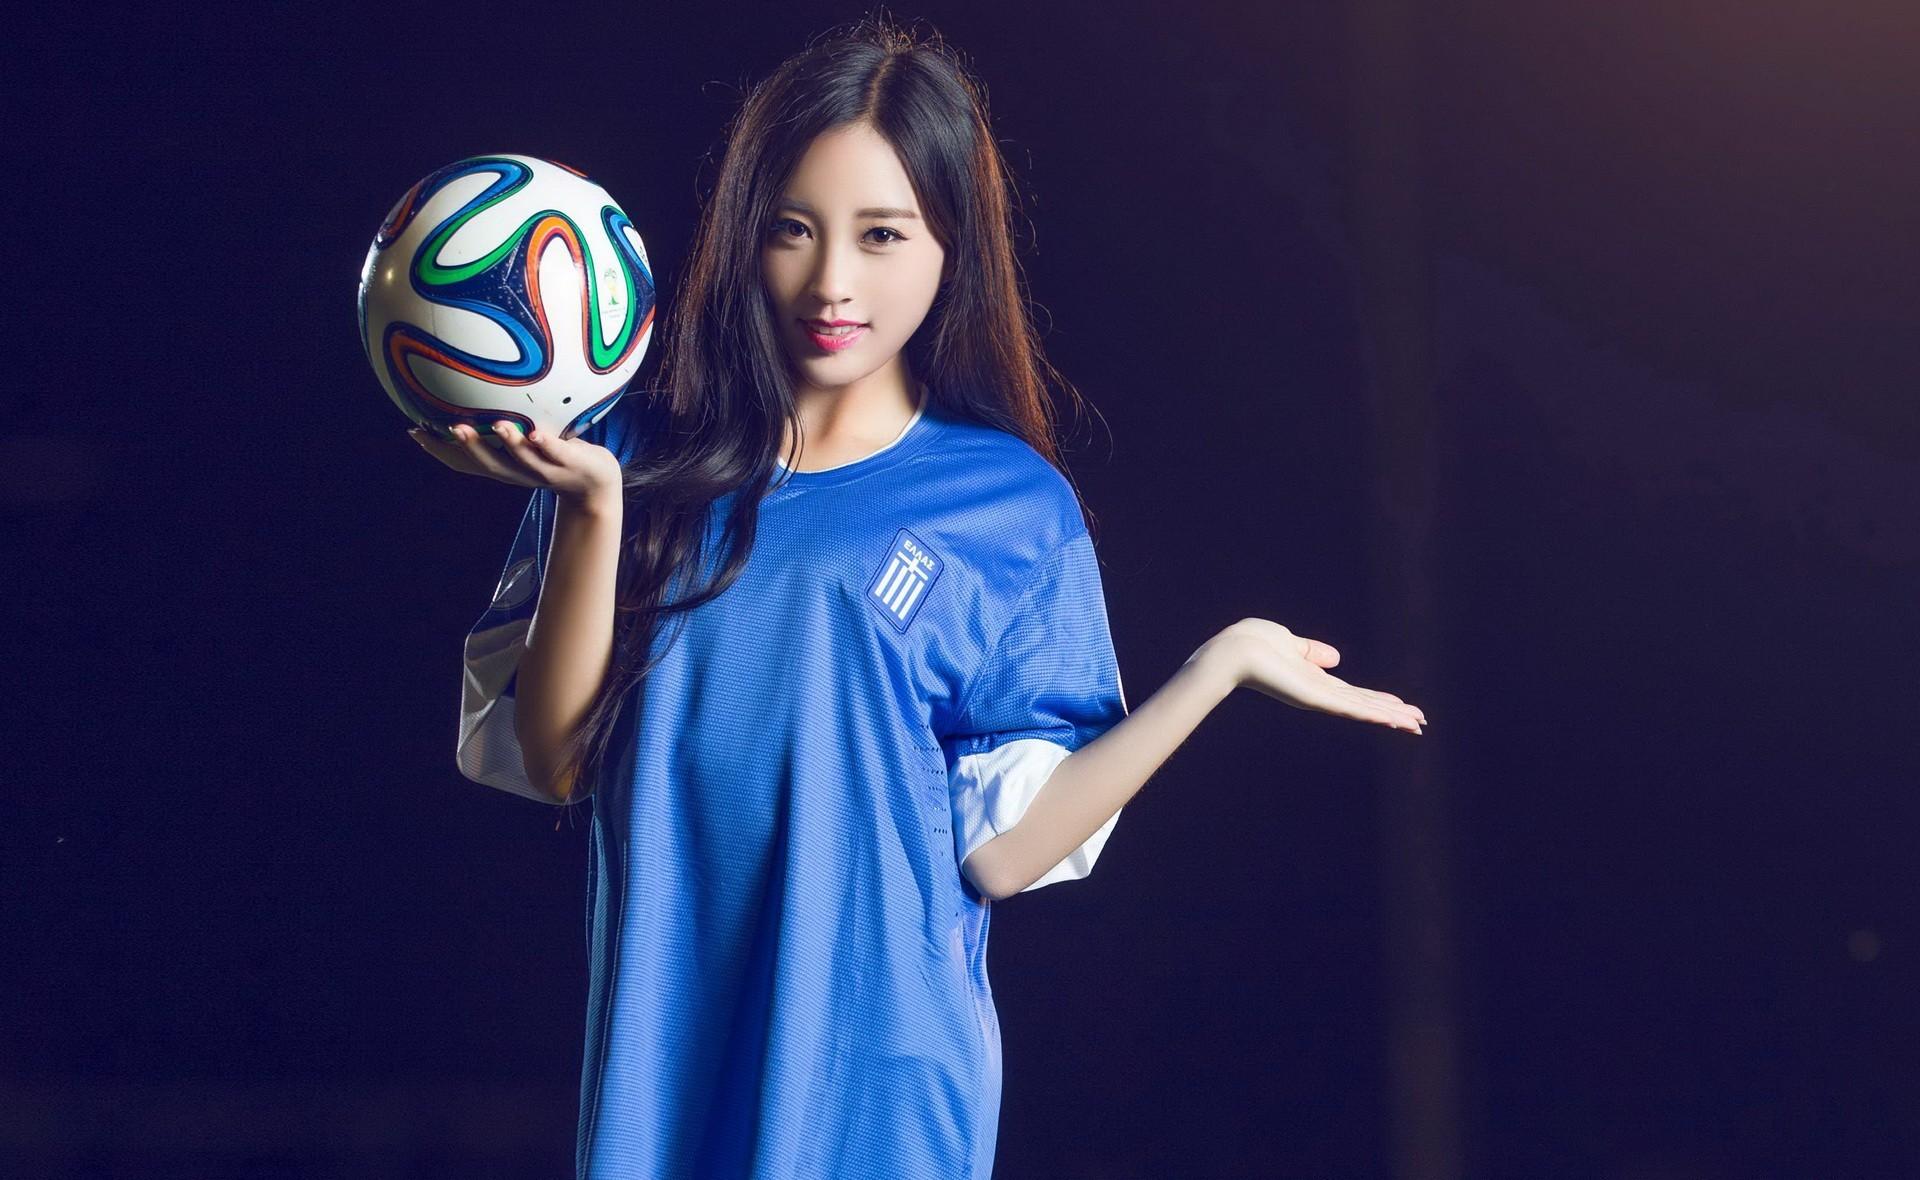 Soccer Girls Wallpaper Free: Asian Full HD Wallpaper And Background